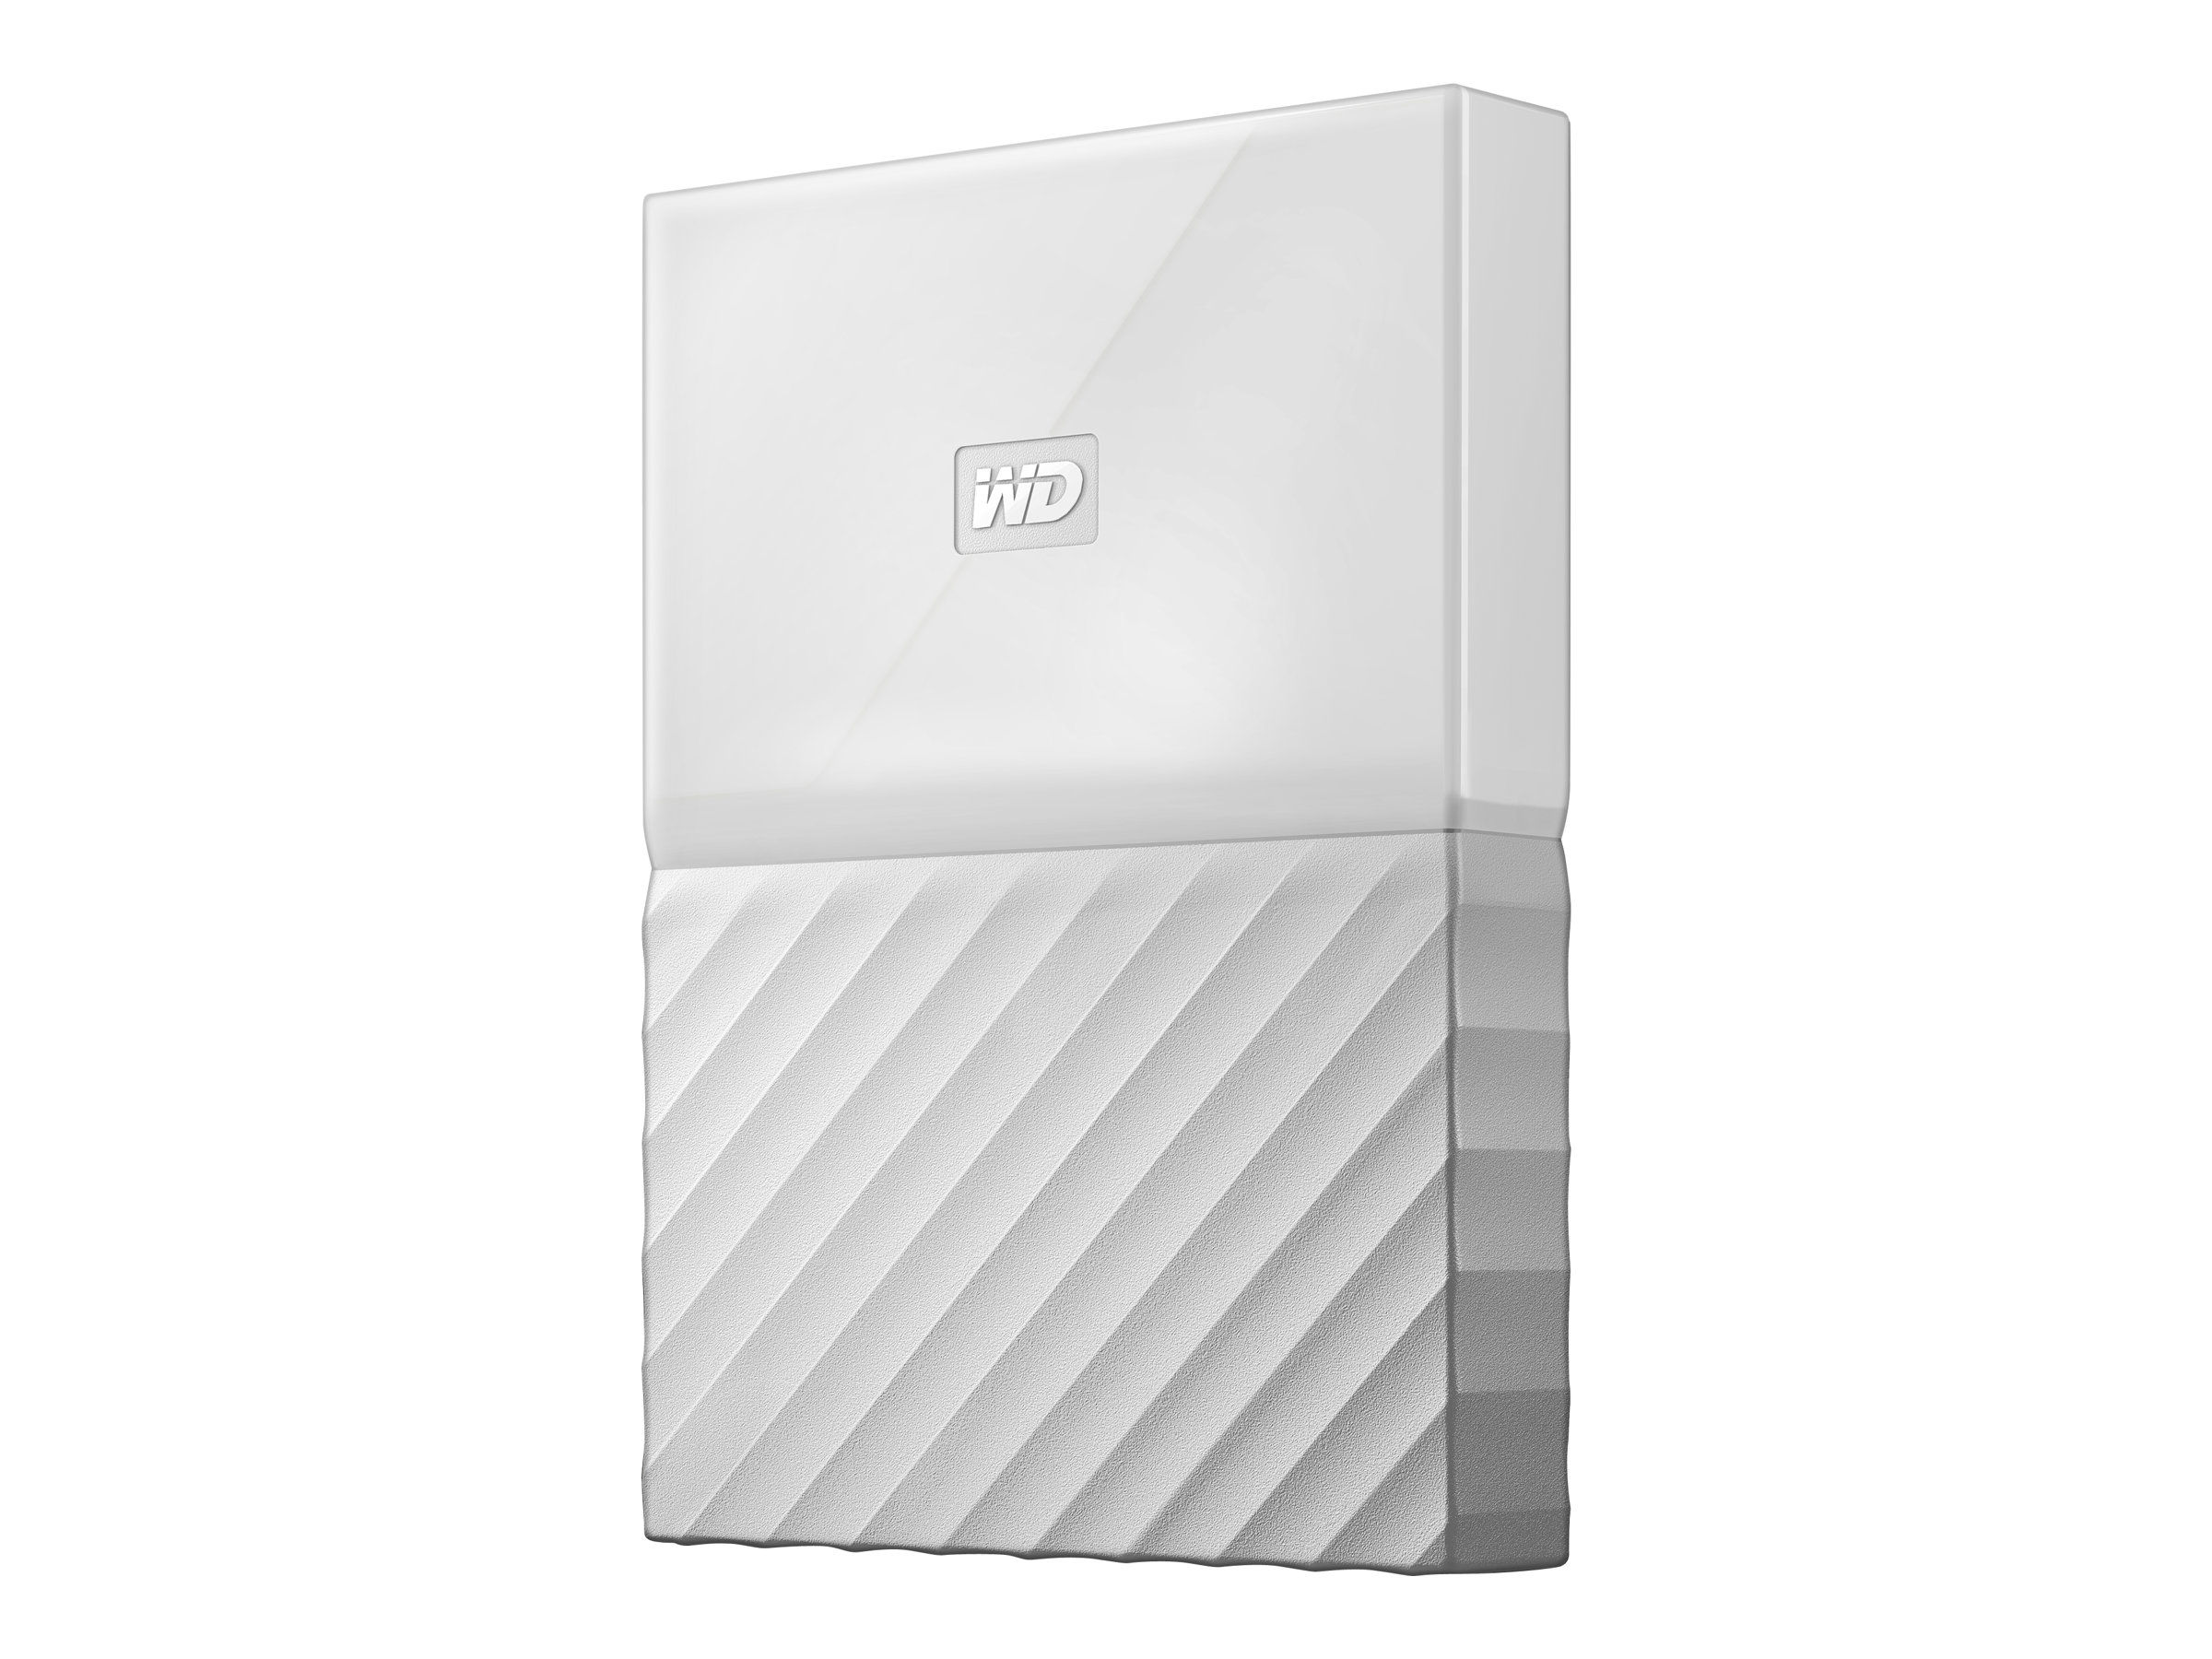 WD My Passport WDBS4B0020BWT - Festplatte - verschlüsselt - 2 TB - extern (tragbar) USB 3.0 - 256-Bit-AES - weiß